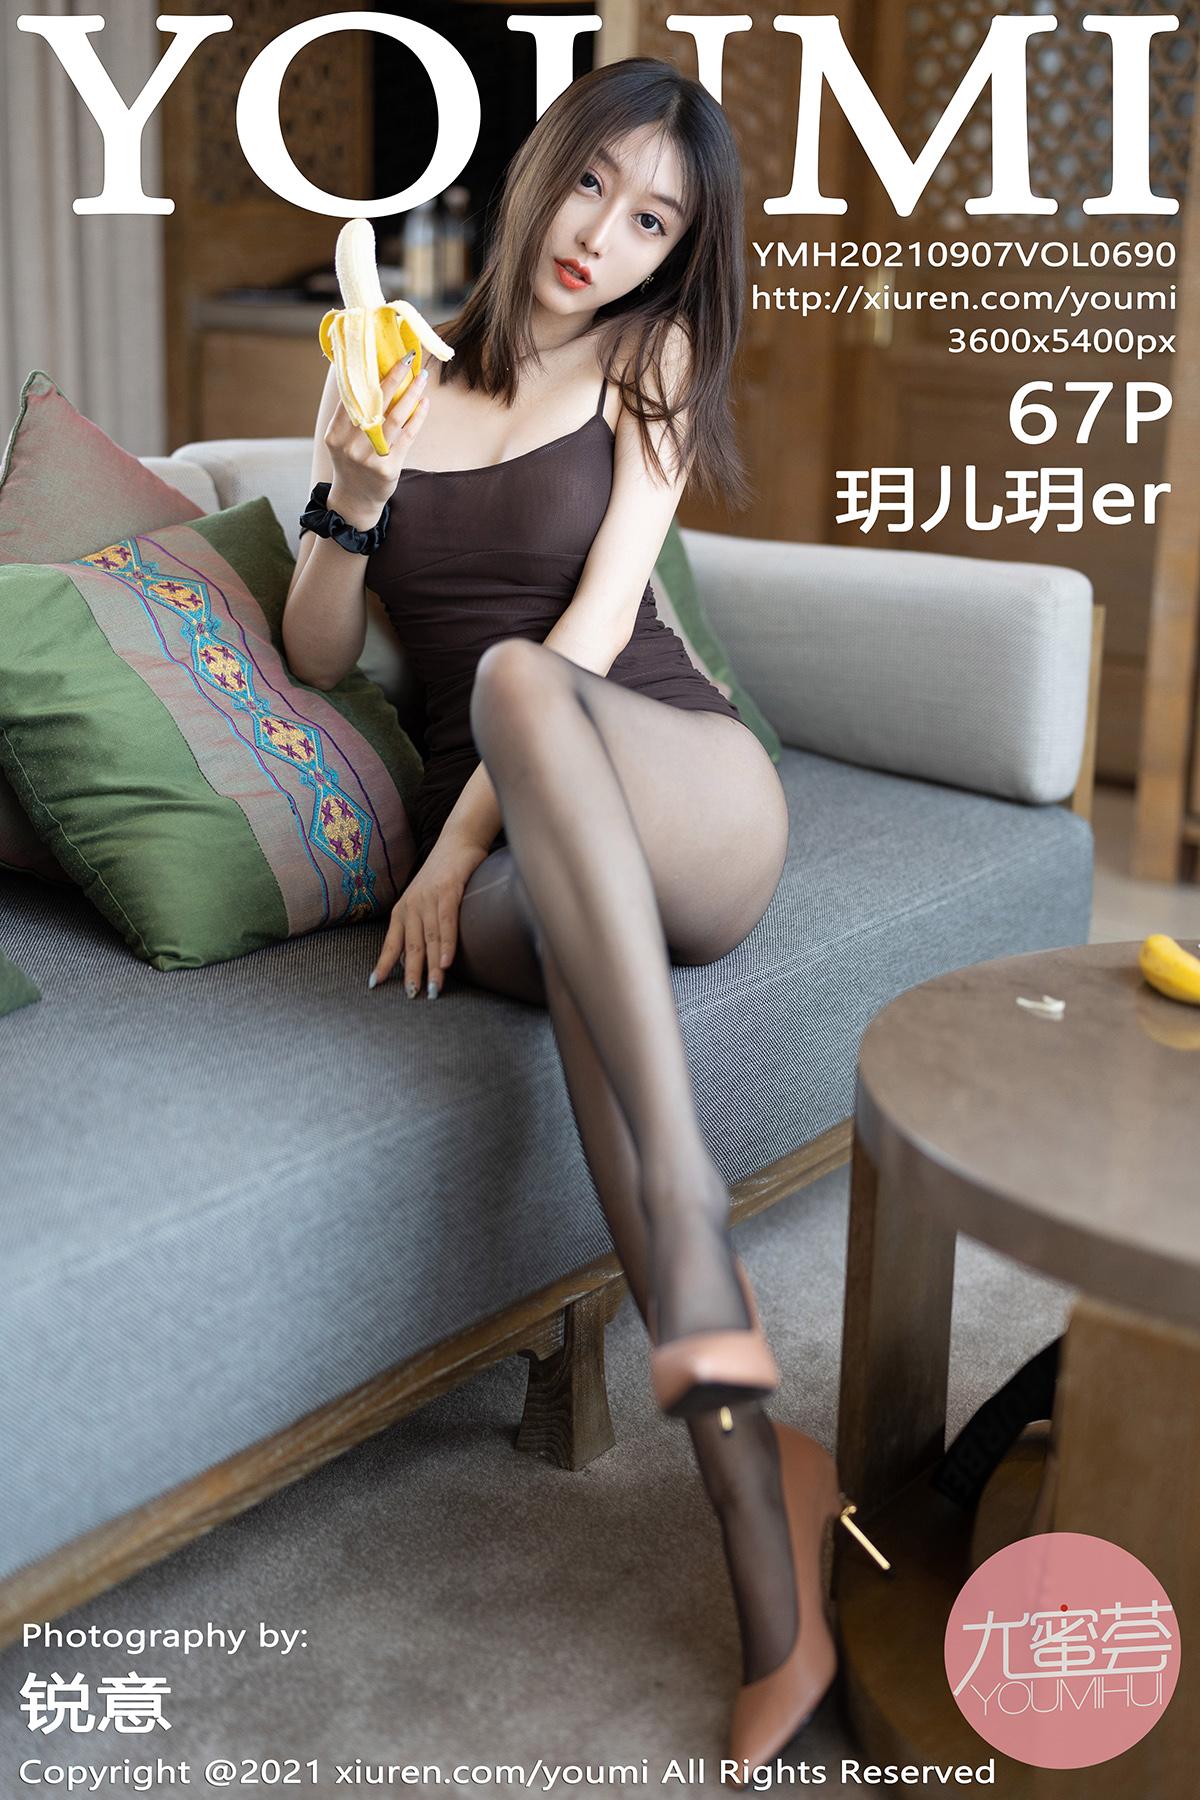 [YOUMI尤蜜荟] 2021.09.07 VOL.690 玥兒玥er 輕薄吊裙與魅惑黑色 [67P] - 貼圖 - 清涼寫真 -